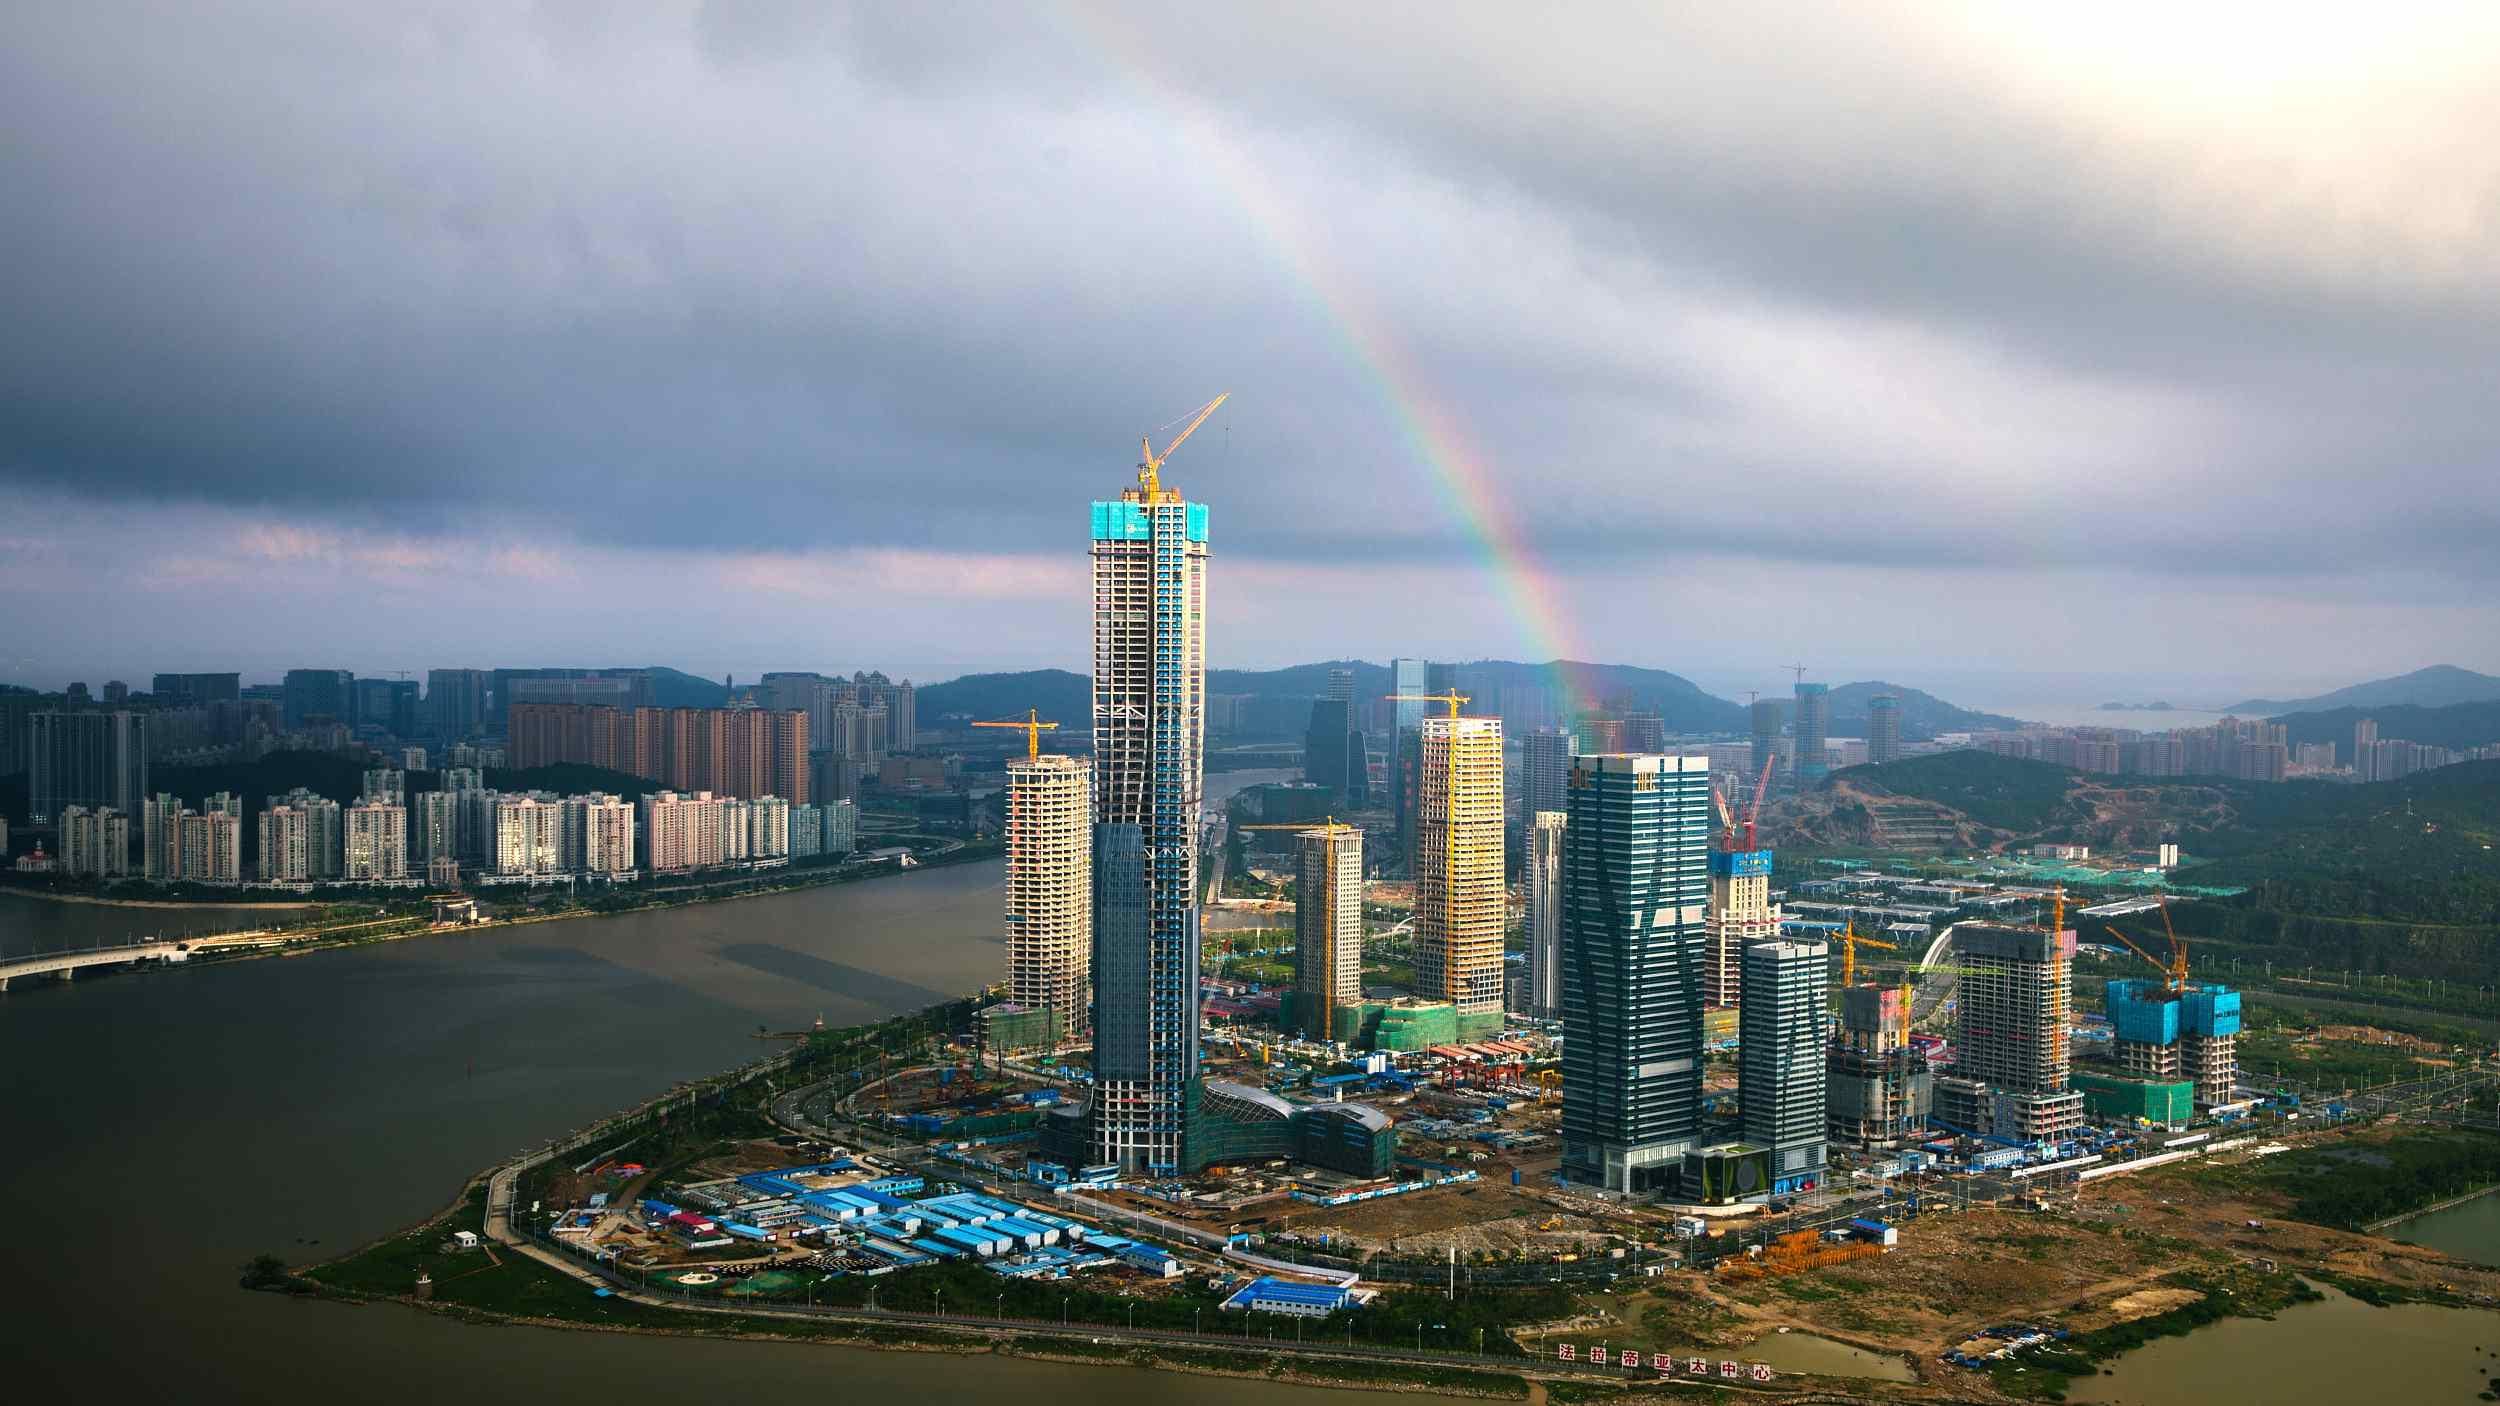 China authorizes jurisdiction of Macao's port zone at Hengqin port to Macao SAR